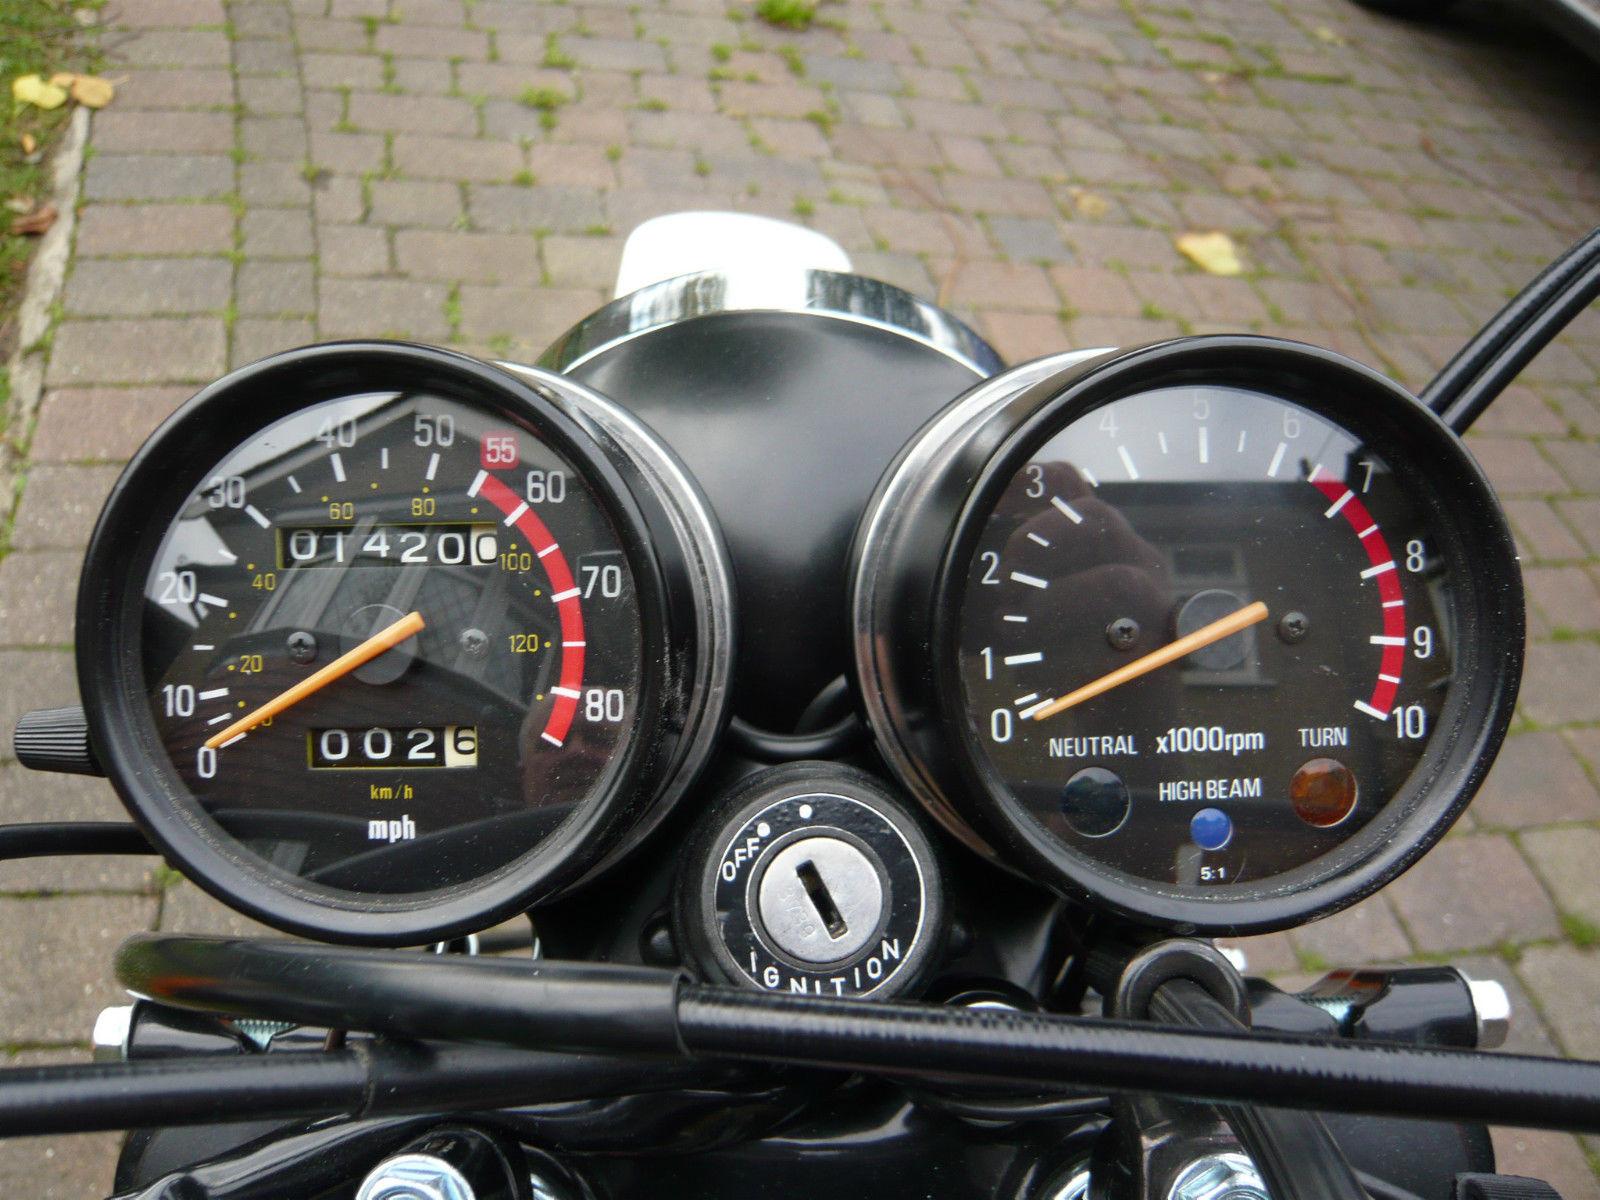 Wiring Yamaha Xt500 1976 Everything About Diagram Xj650 Enduro